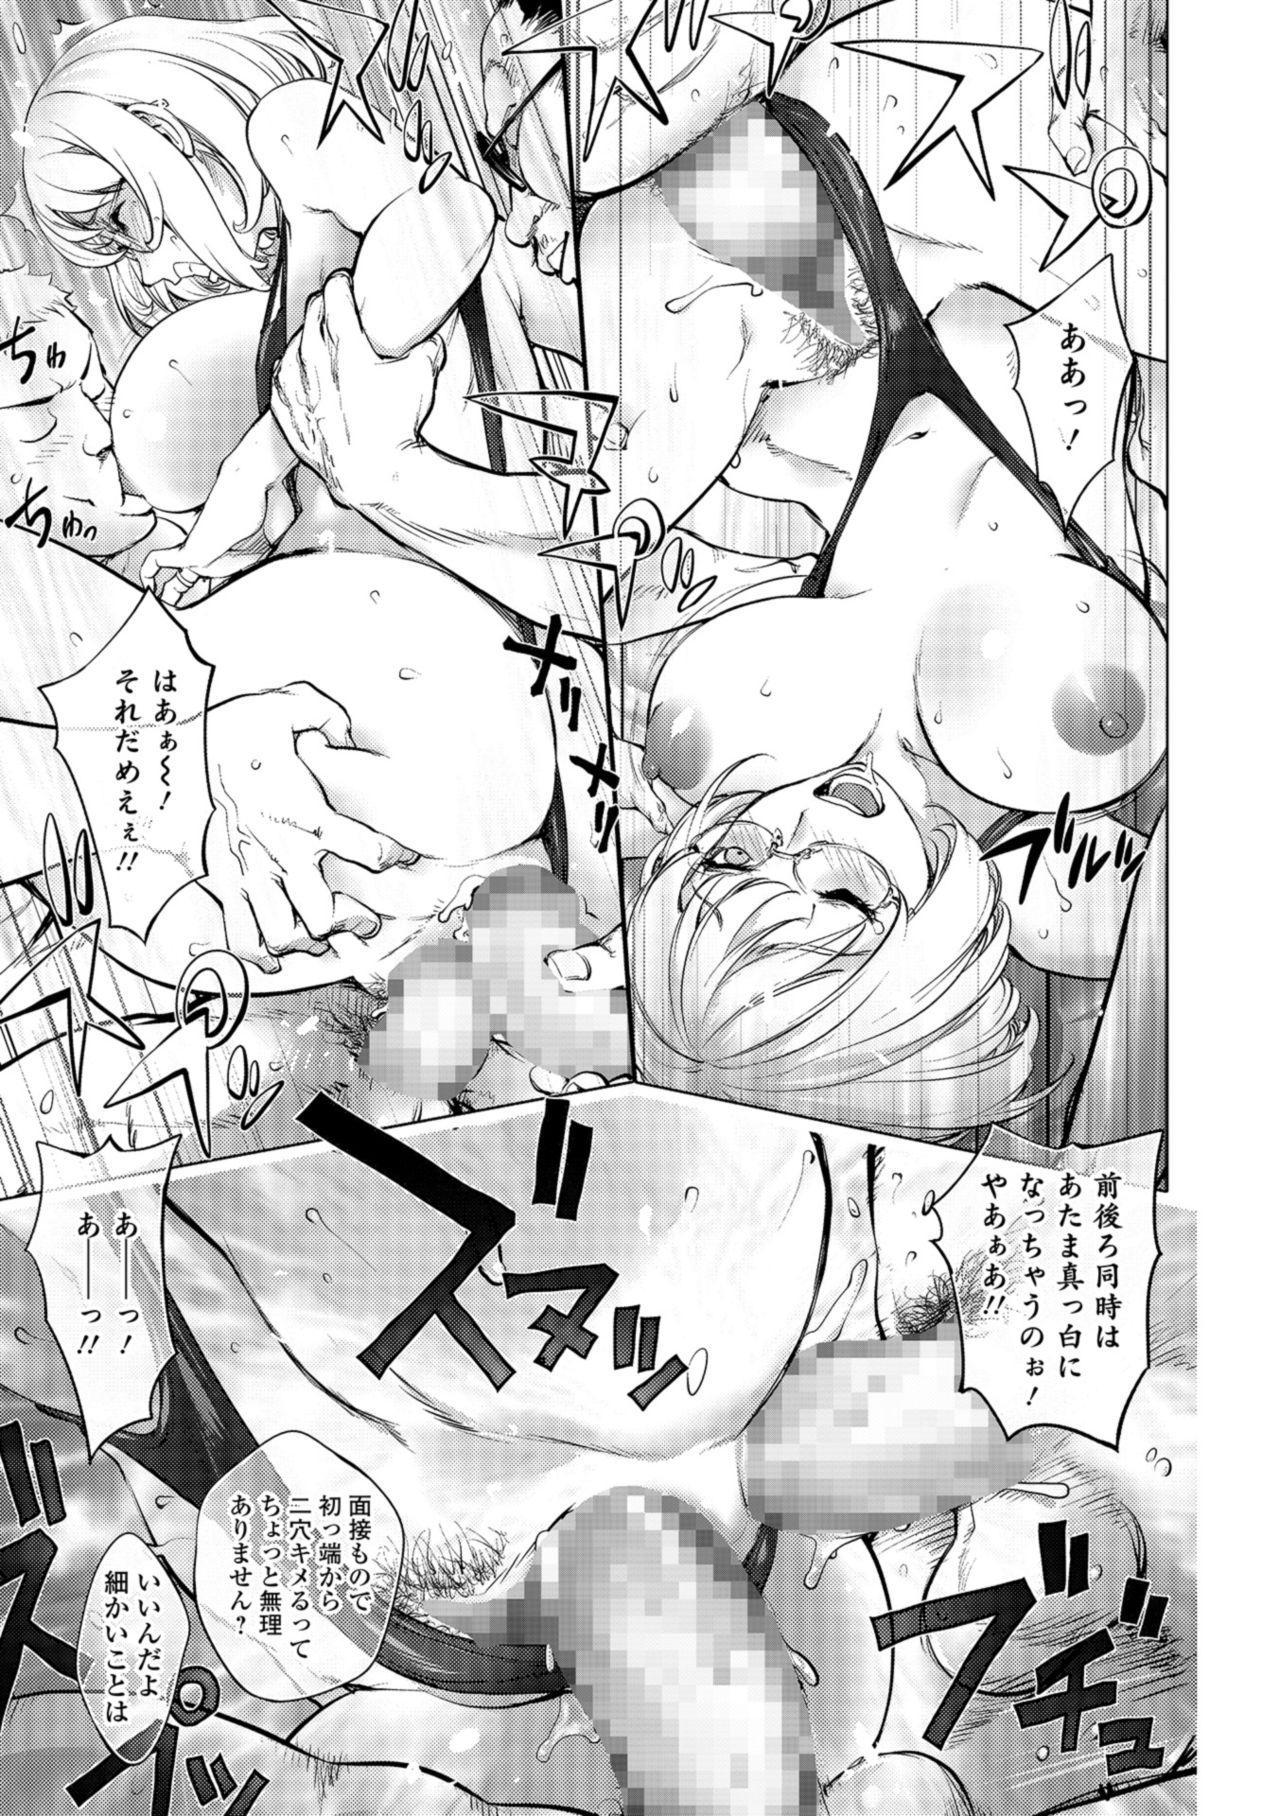 COMIC Shigekiteki SQUIRT!! Vol. 09 70